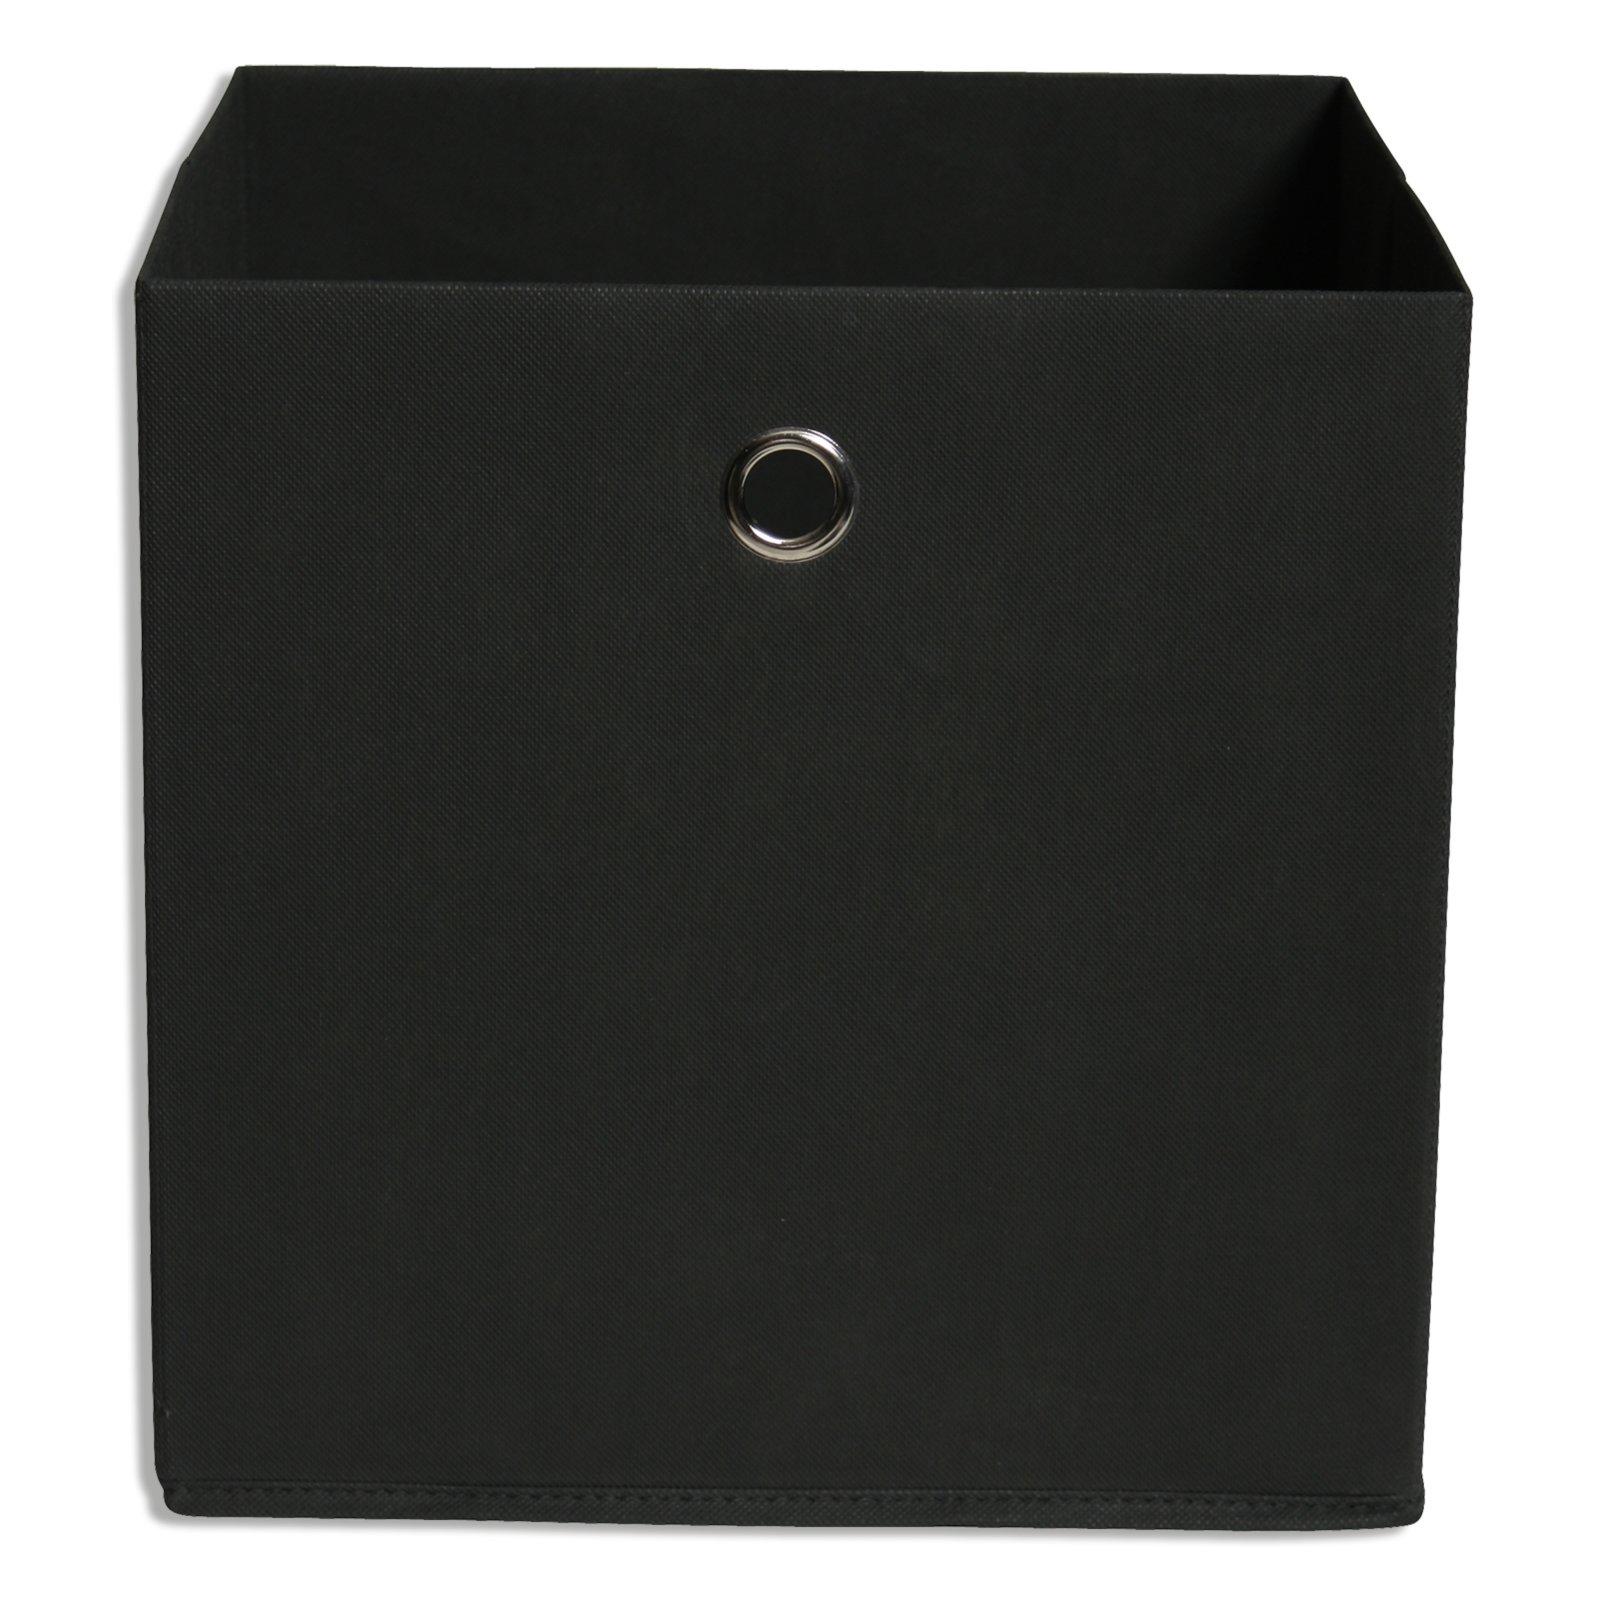 Faltbox - anthrazit - mit Metallöse - 32x32 cm